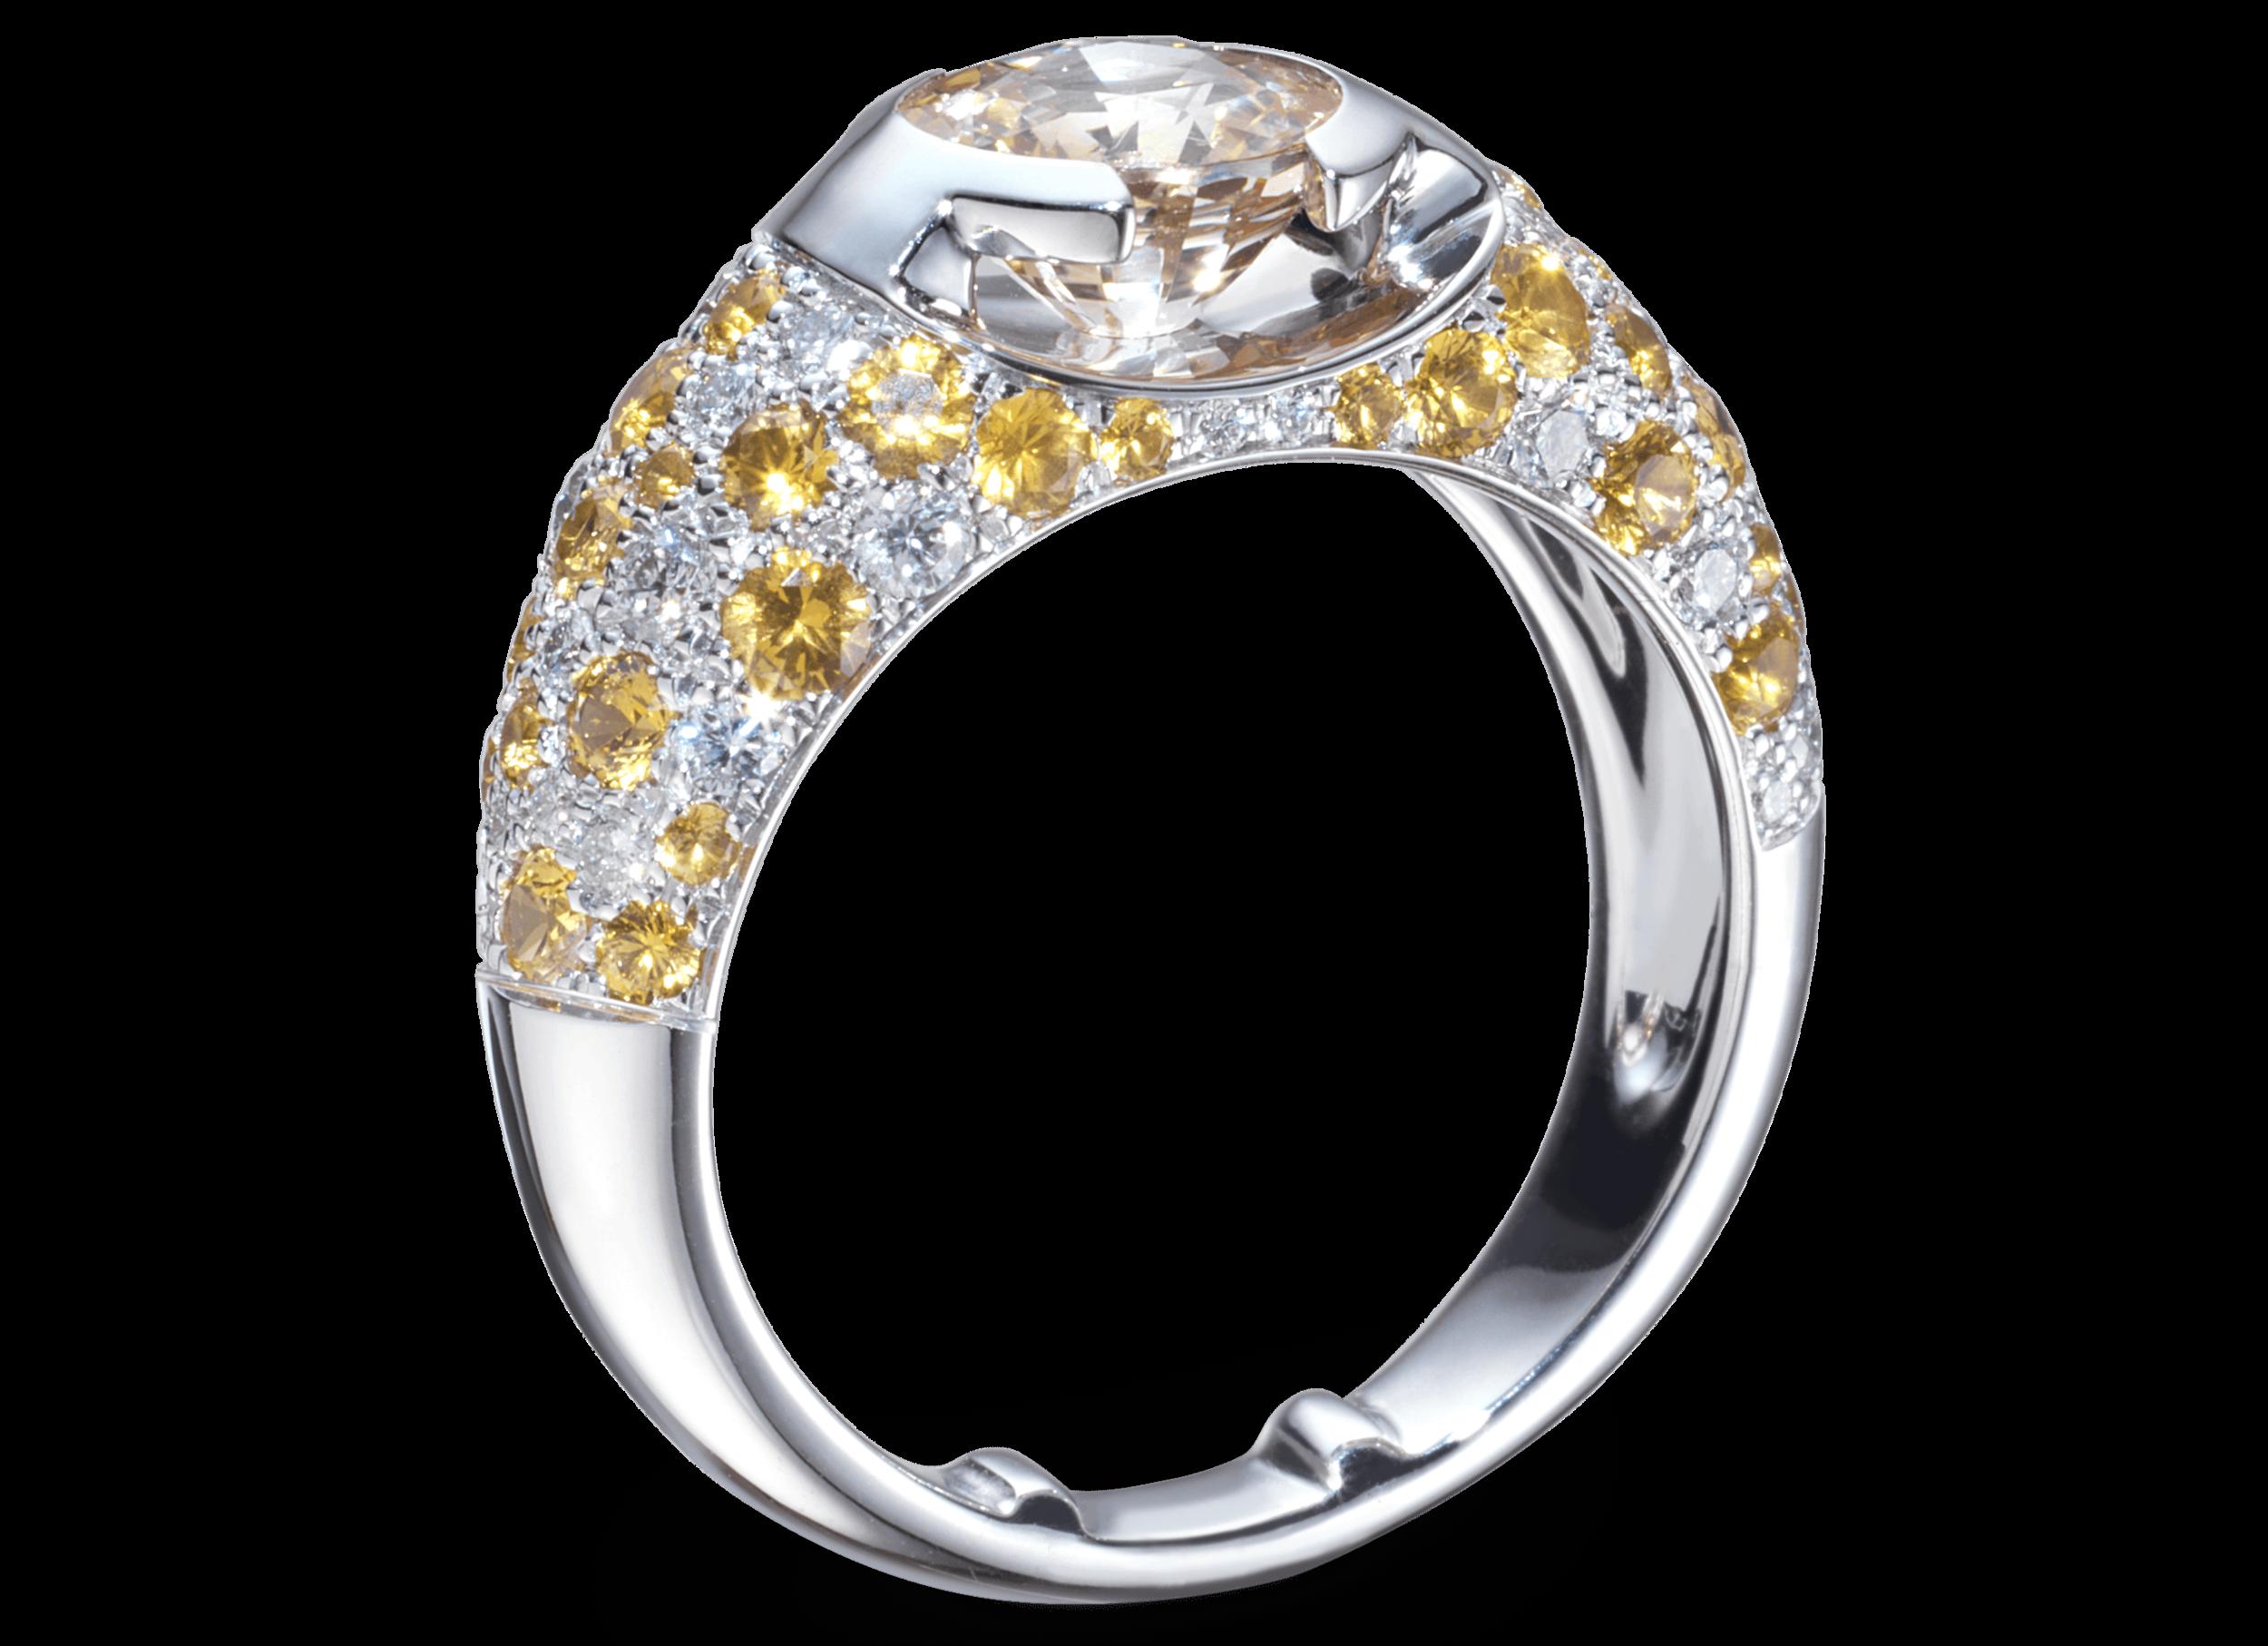 Bague Eolia or blanc Saphir jaune naturel 1,59 carat et pavage de diamants et saphirs jaune